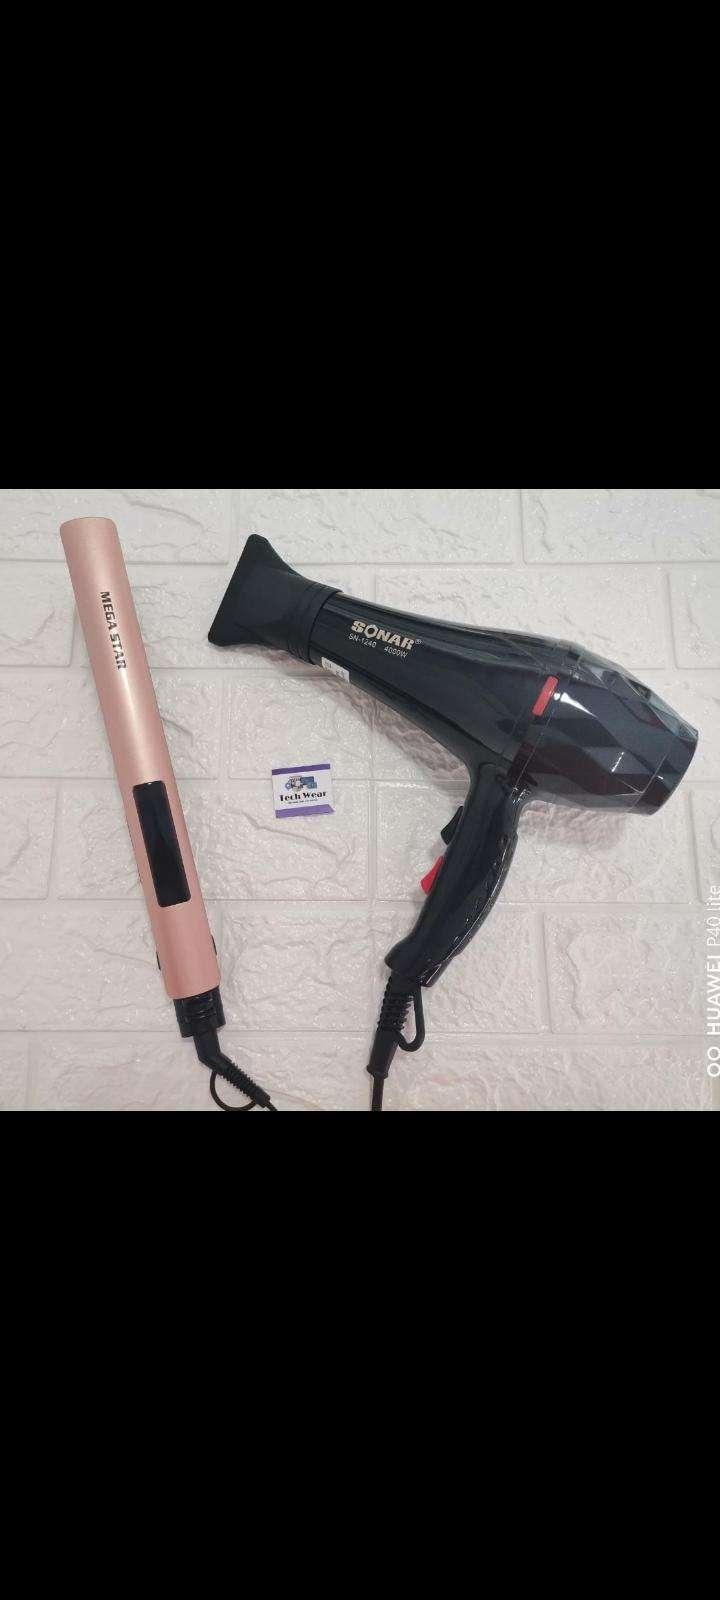 Planchita Mega Star+ secador profesional Sonar - 0